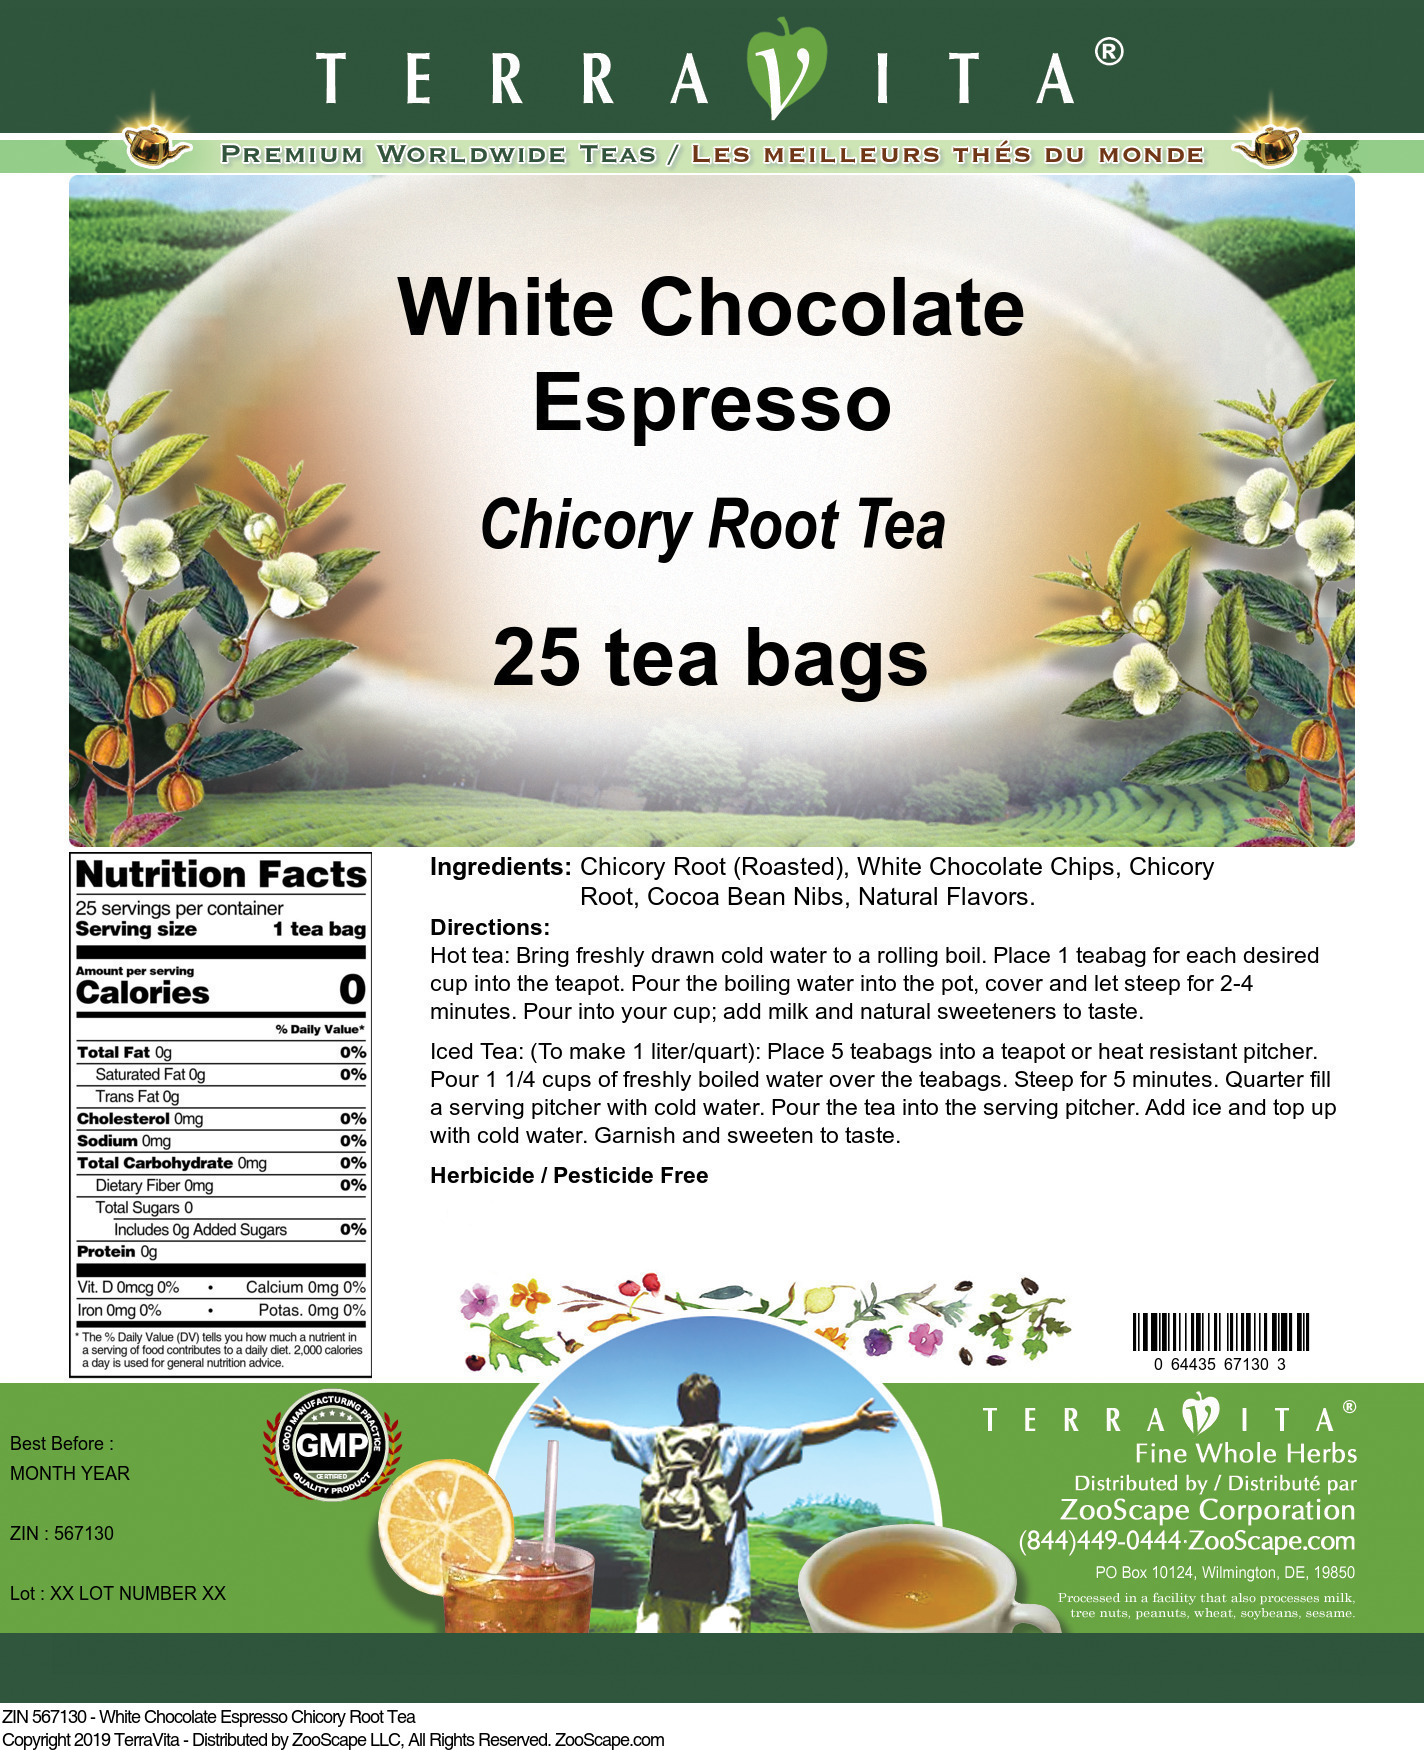 White Chocolate Espresso Chicory Root